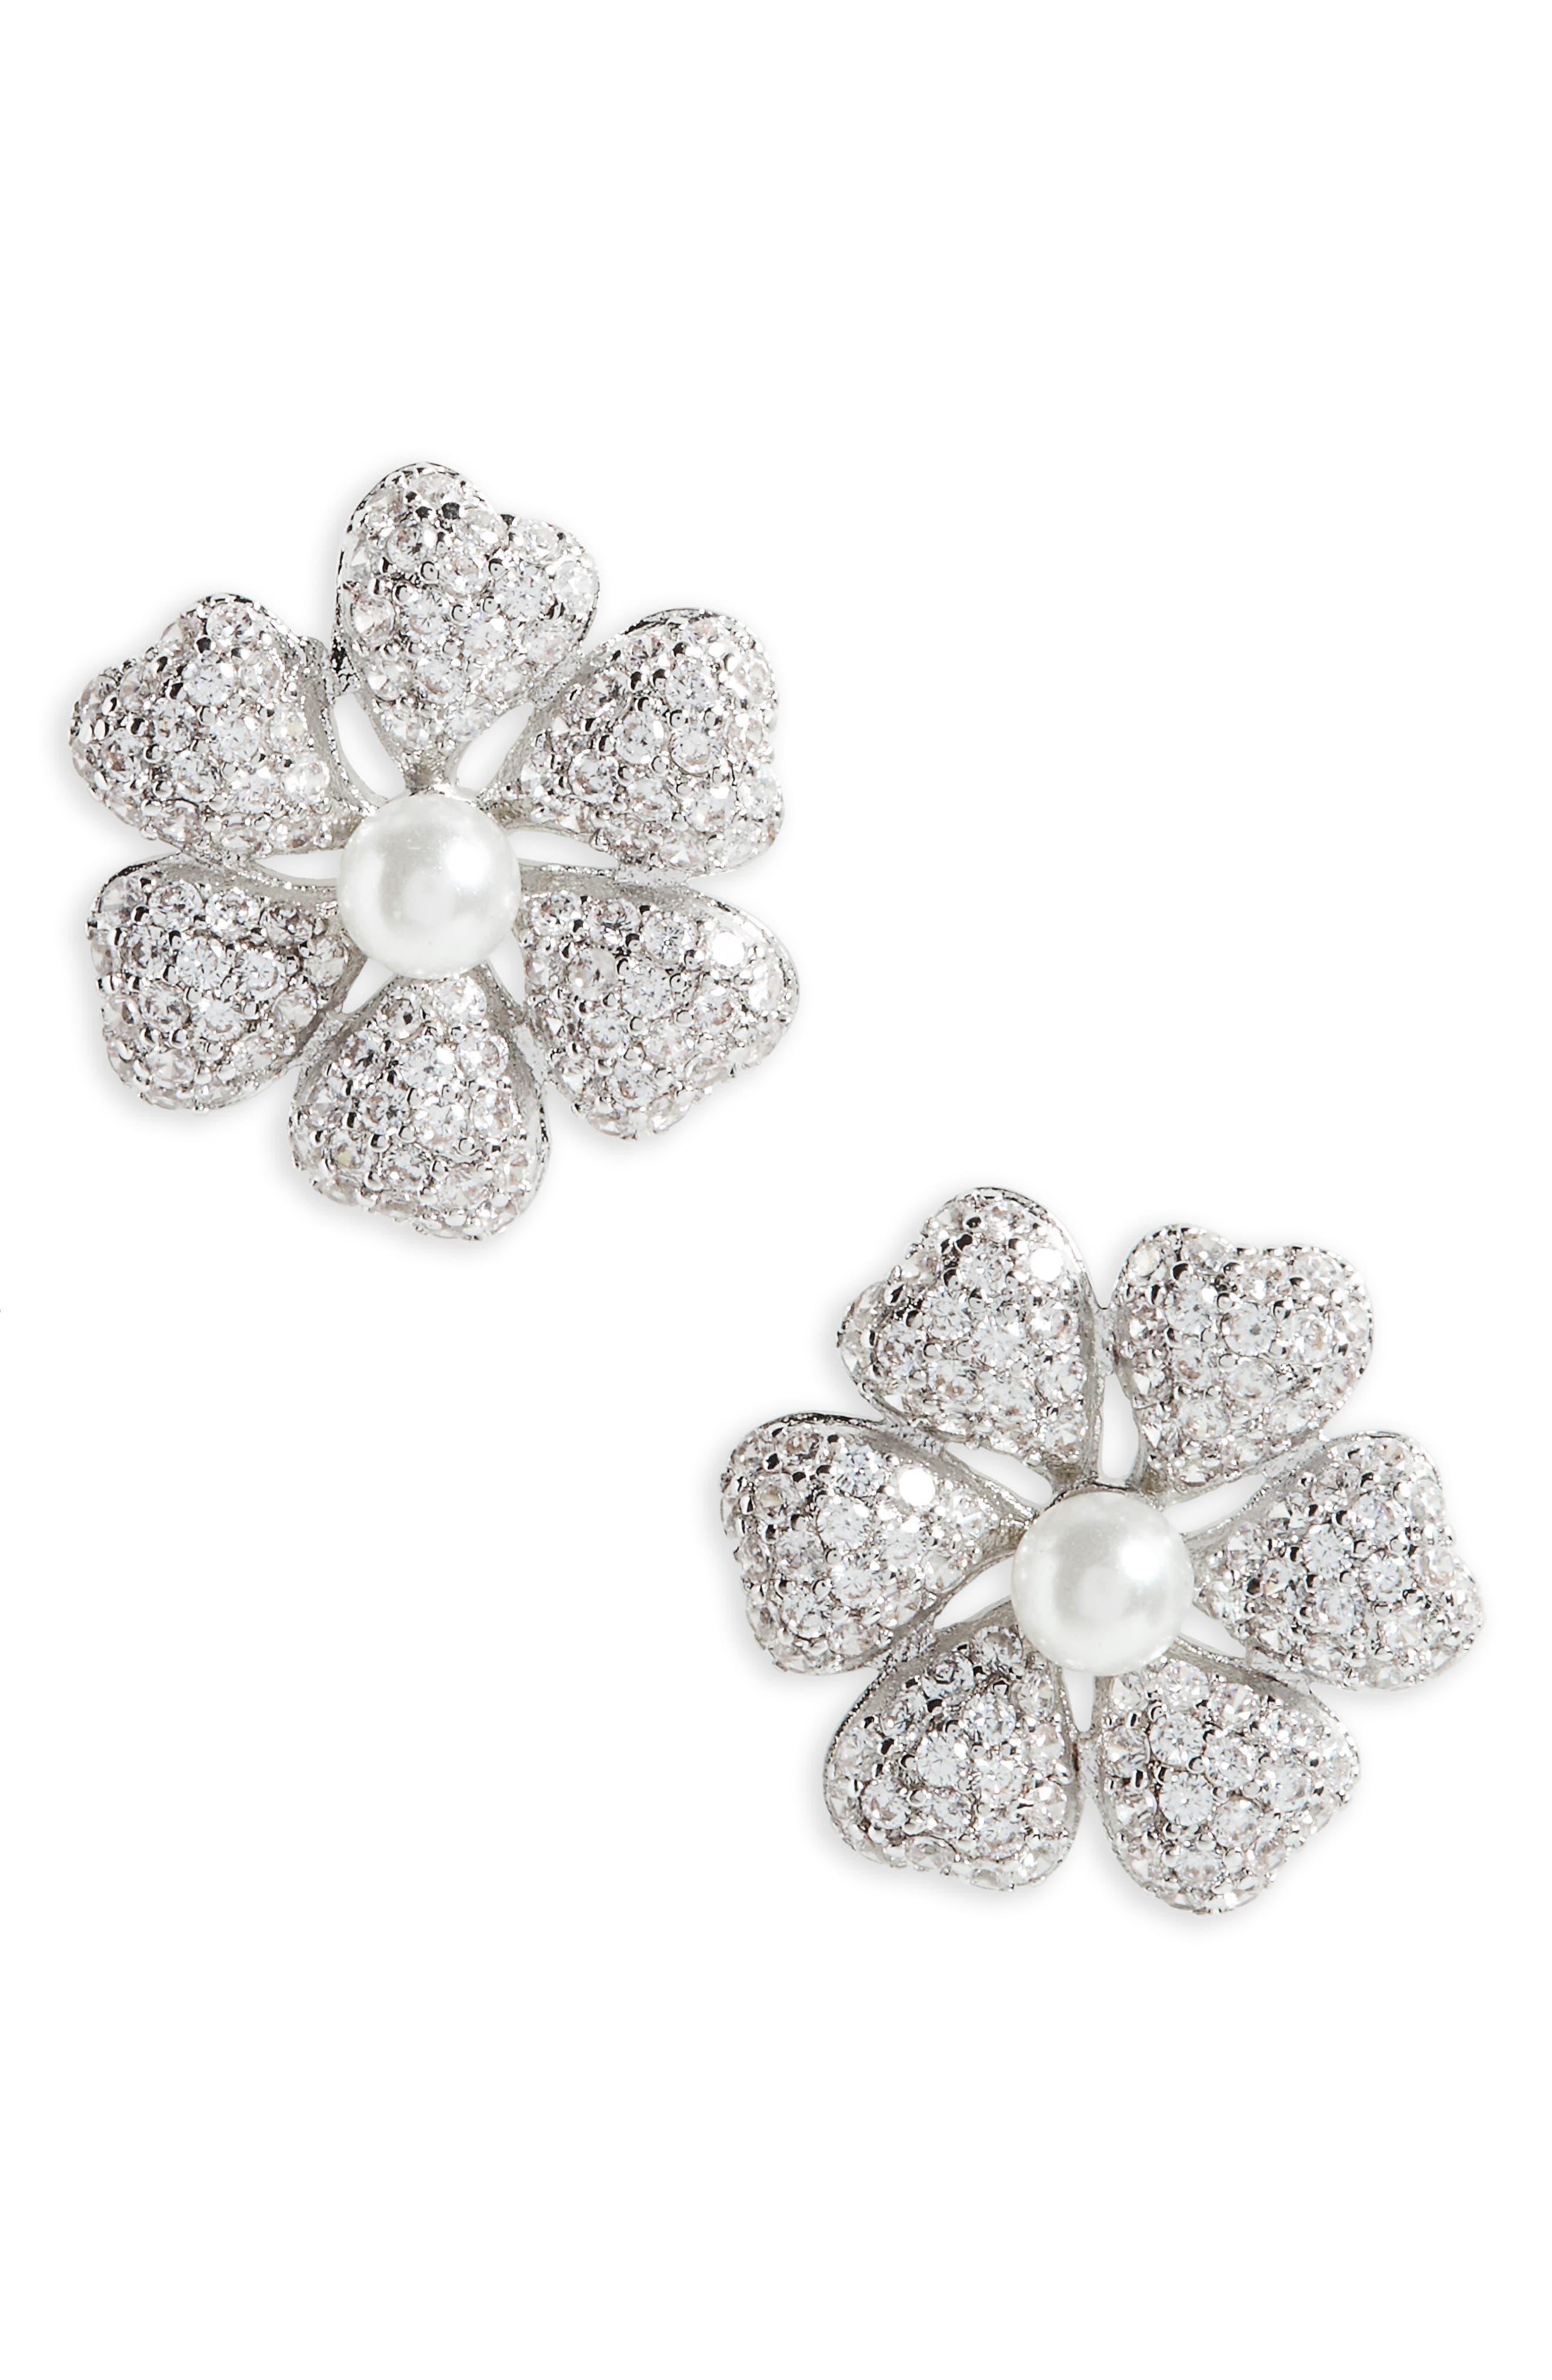 Flower Crystal & Imitation Pearl Stud Earrings,                             Main thumbnail 1, color,                             040